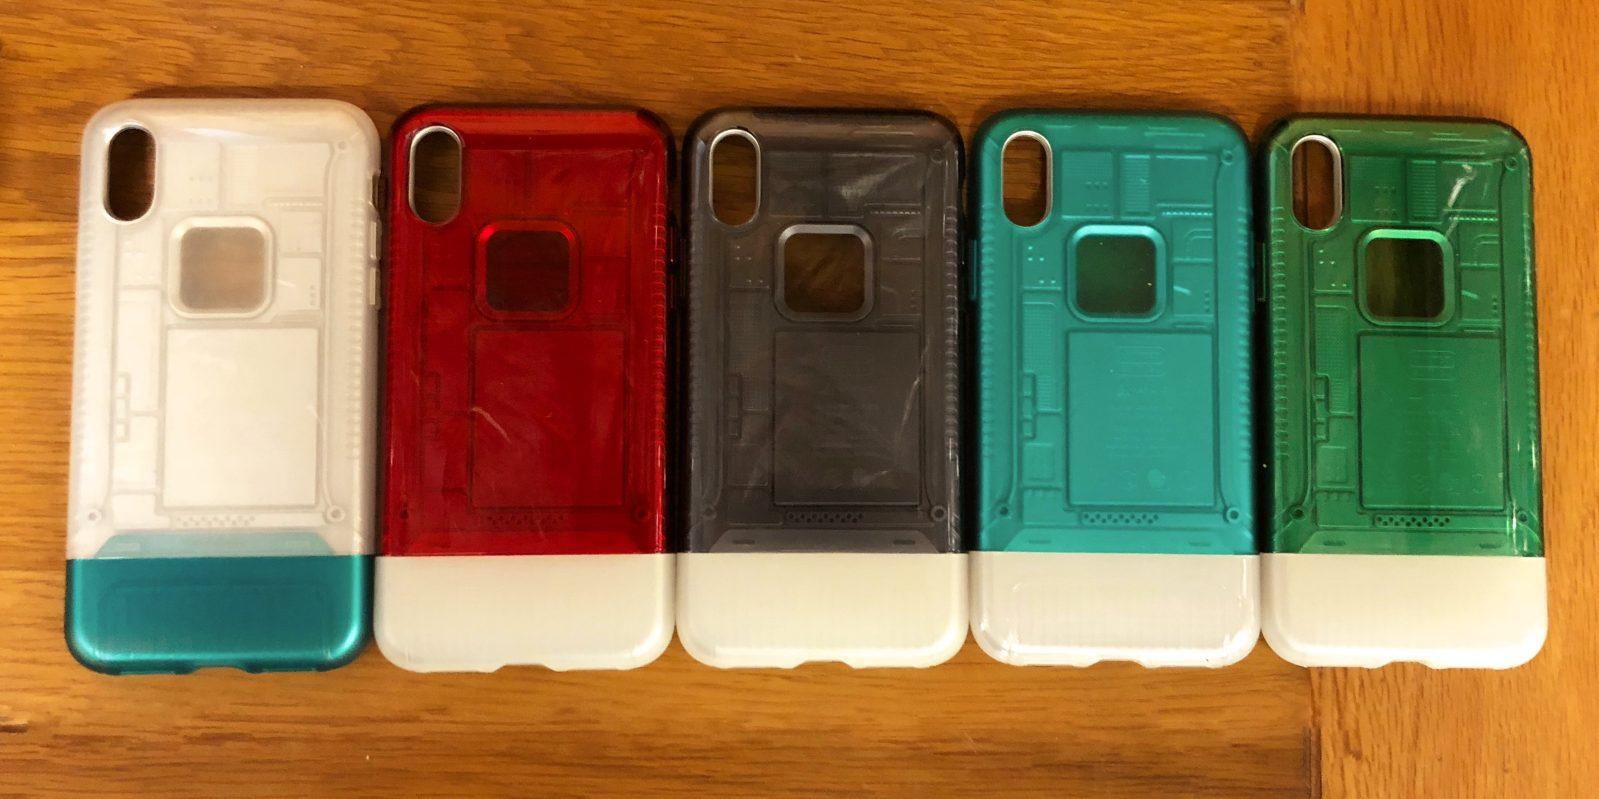 Spigen 9to5mac spigen announces special edition iphone x cases echoing imac g3 and original iphone design fandeluxe Gallery